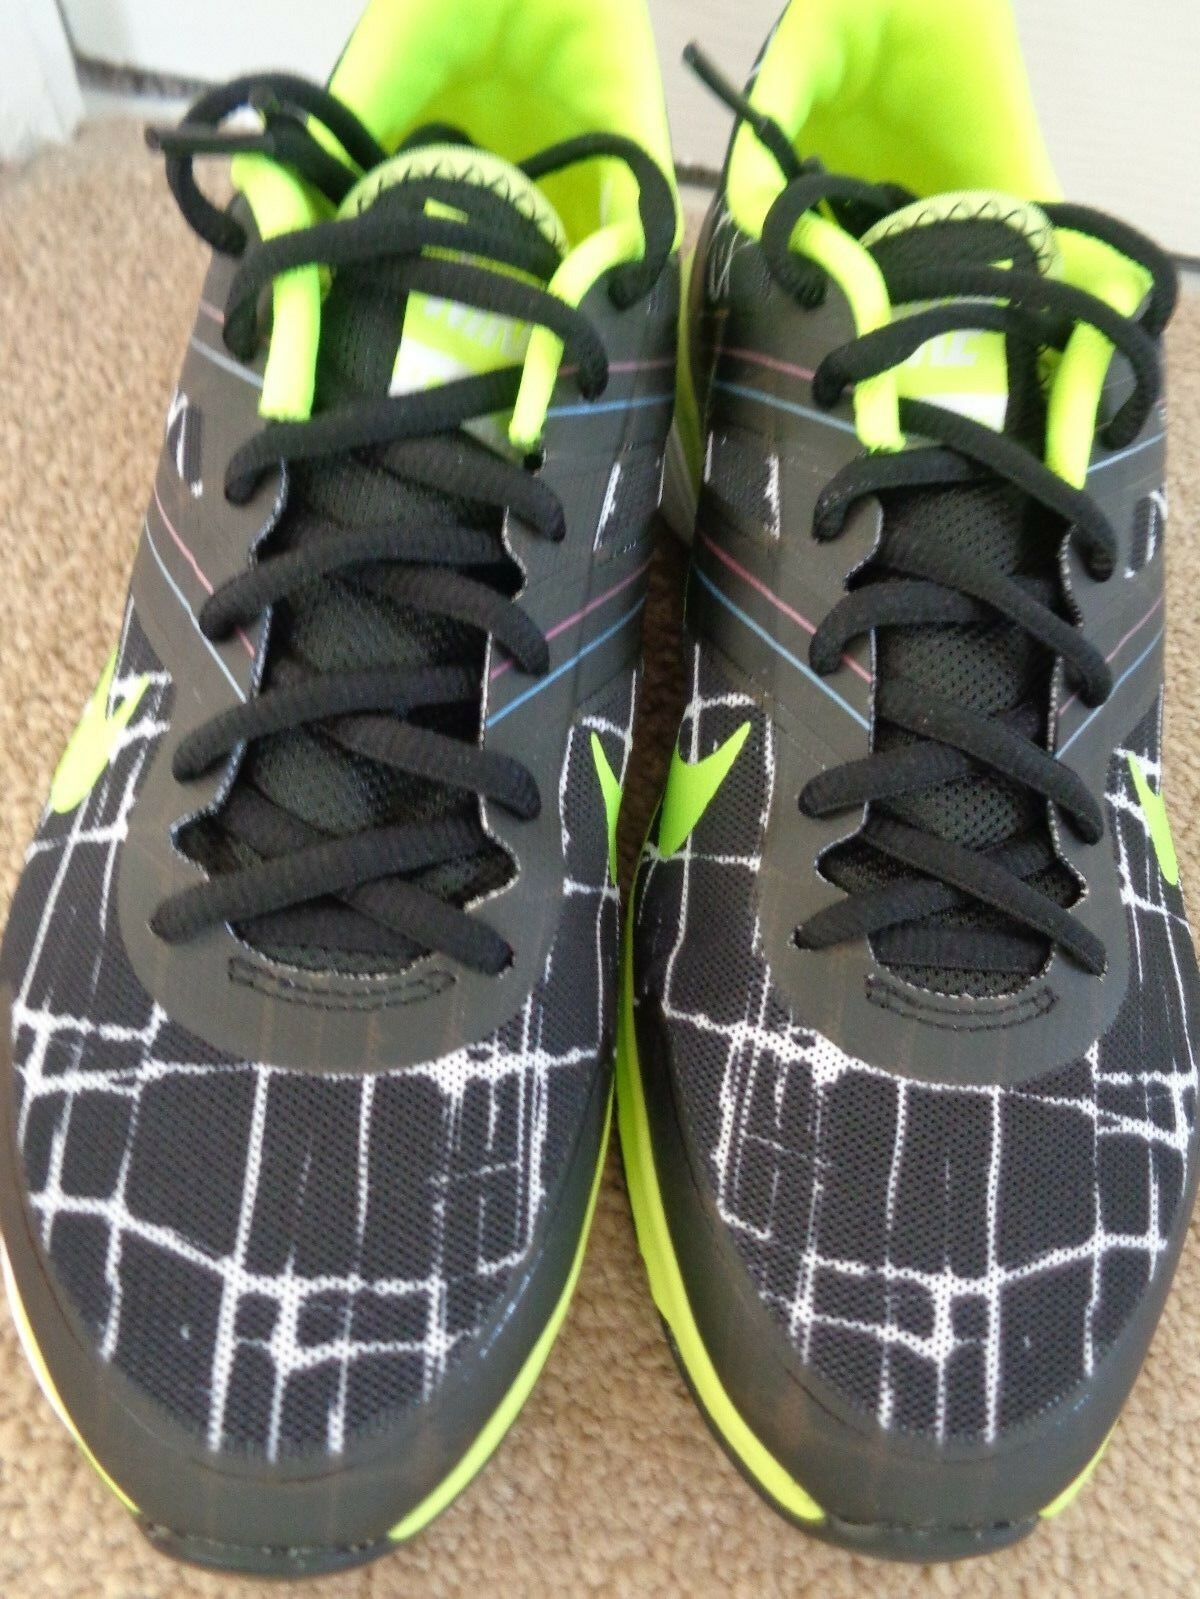 Nike Dual Fusion TR 2 print Donna trainers 631661 003 us uk 4.5 eu 38 us 003 7 NEW+BOX 16649c